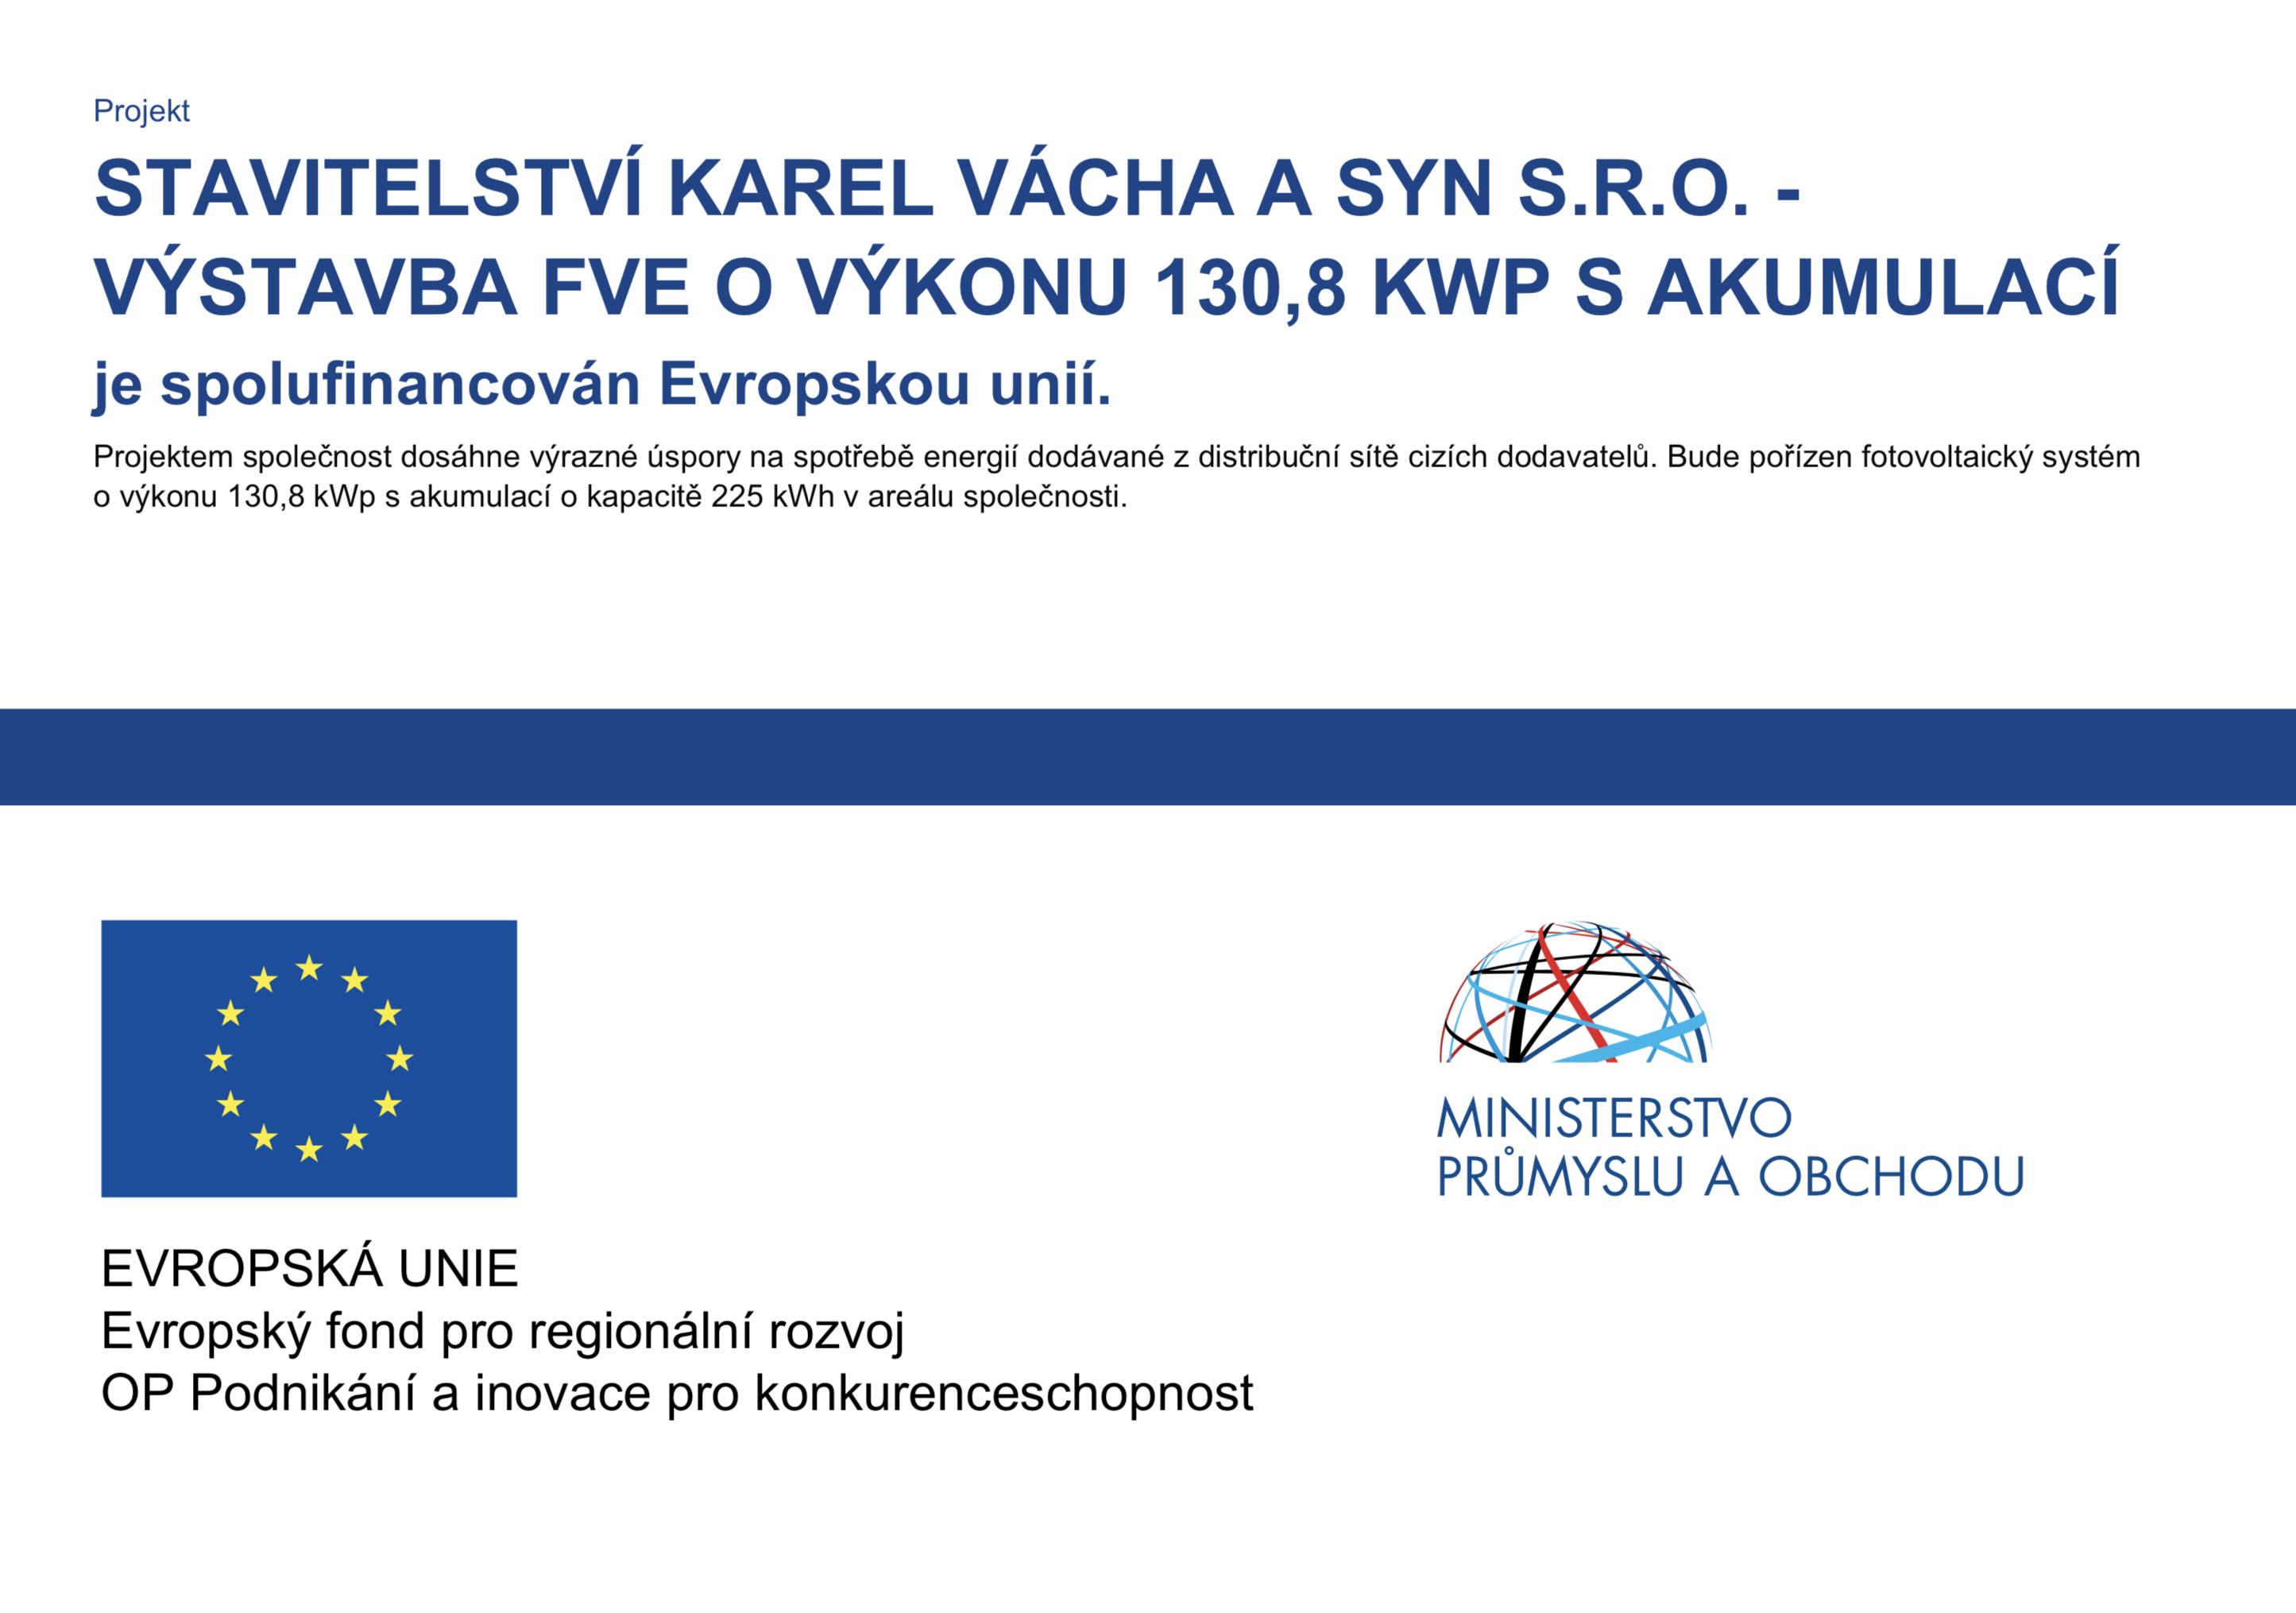 Projekt EU - Výstavba FVE